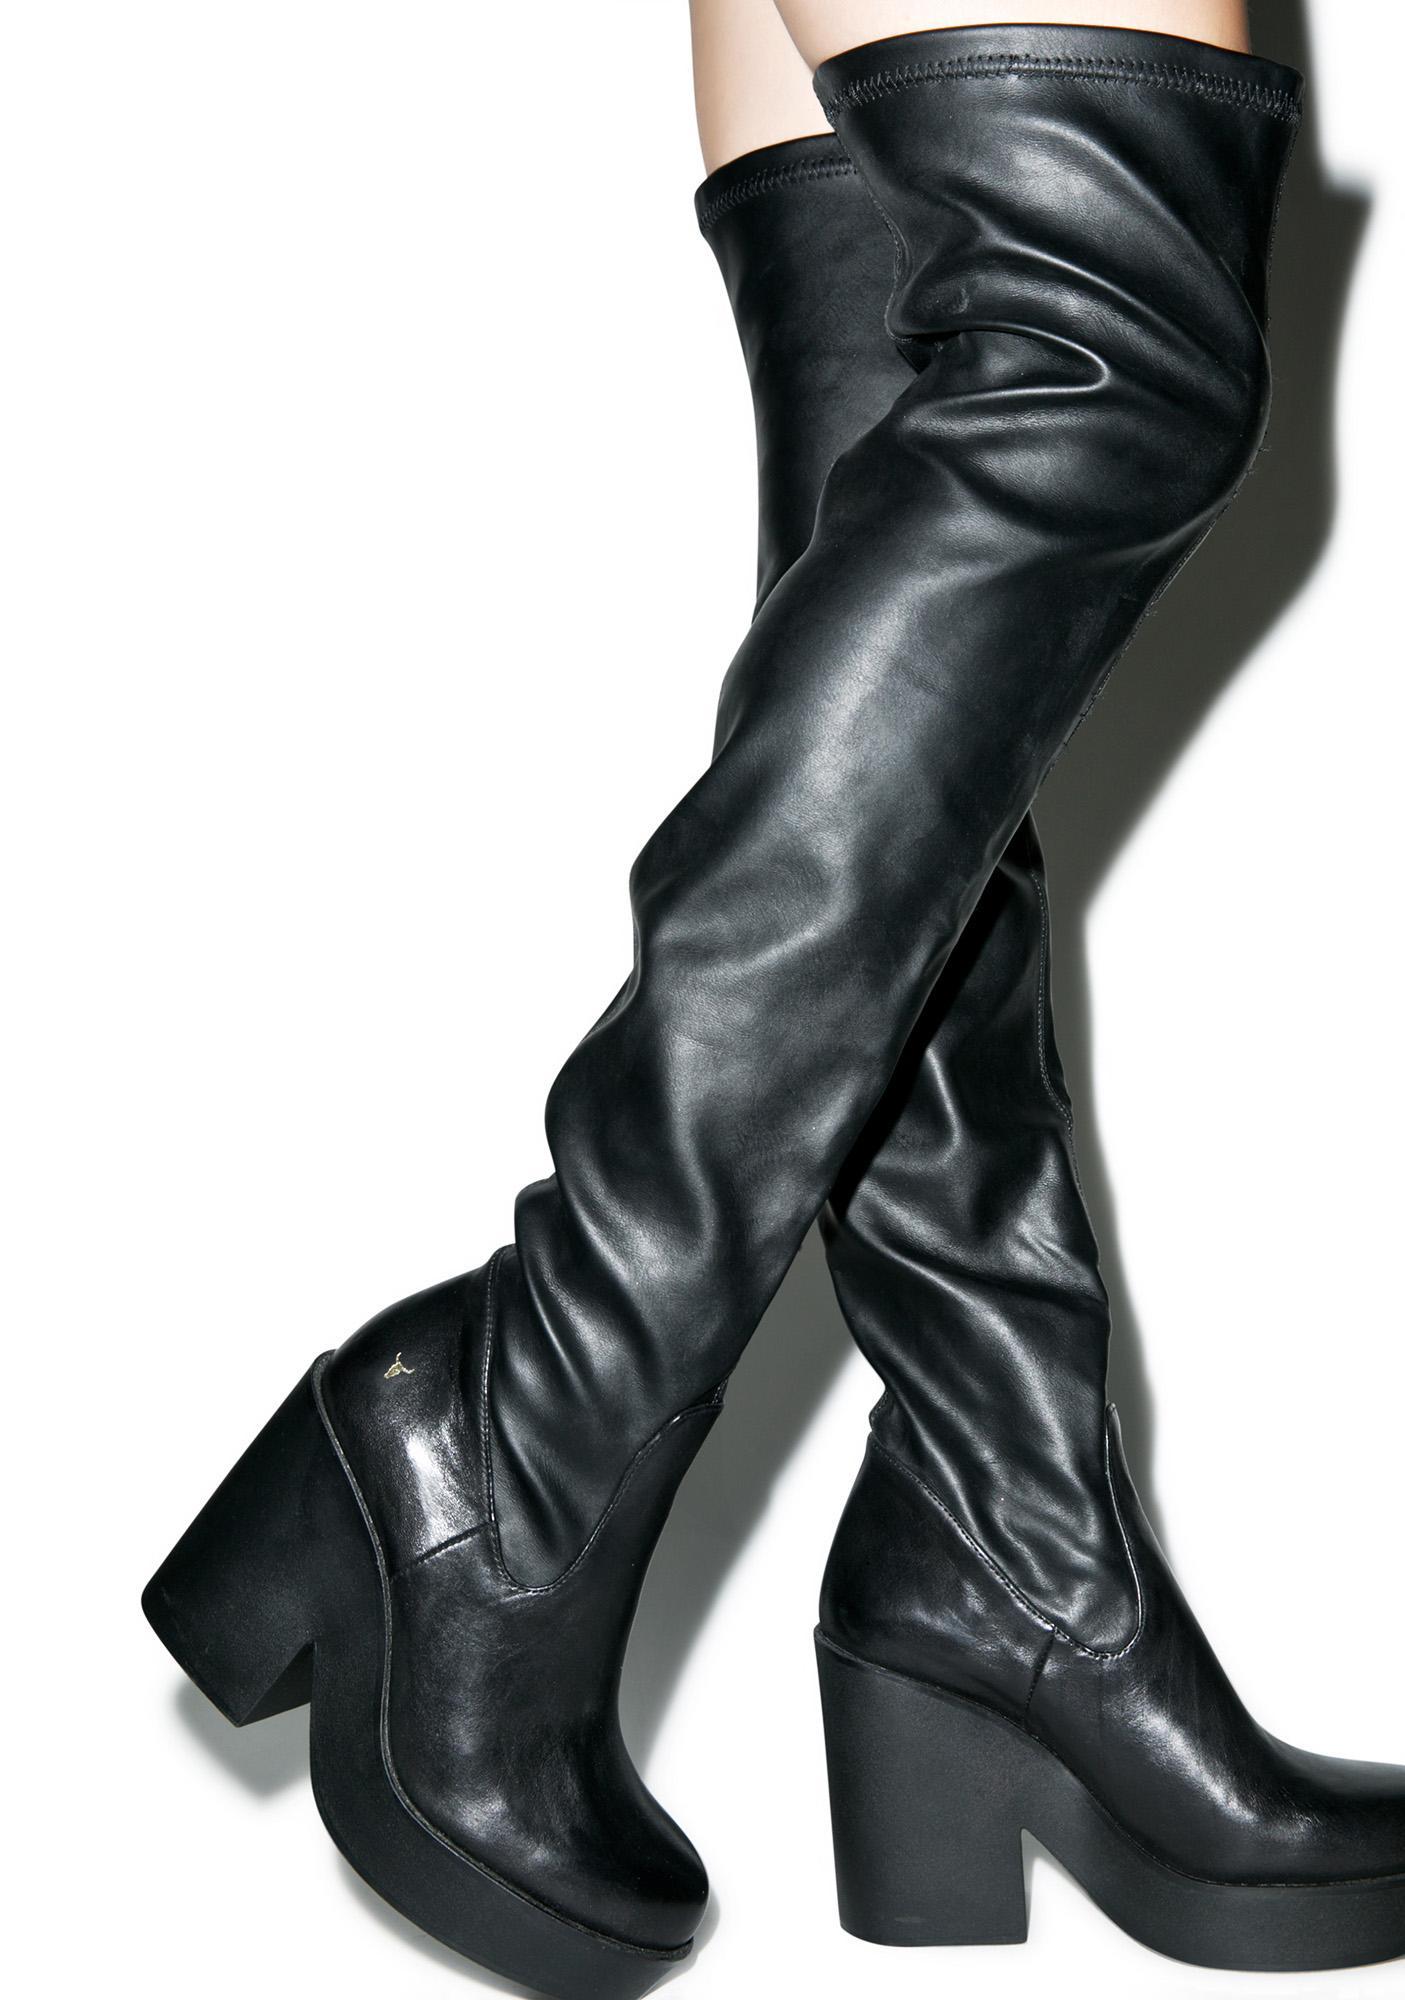 windsor smith seb thigh high boots | dolls kill